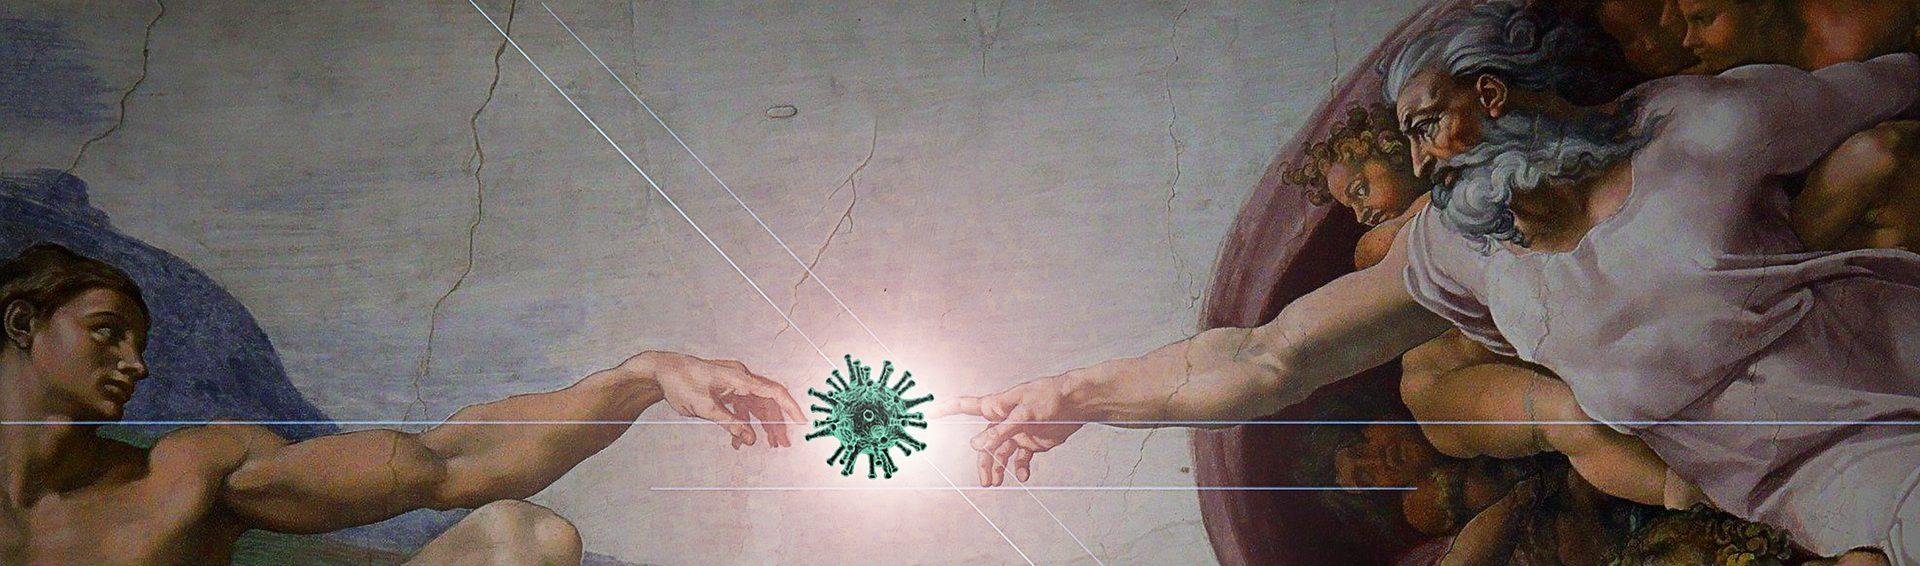 Michelangelo pandemic